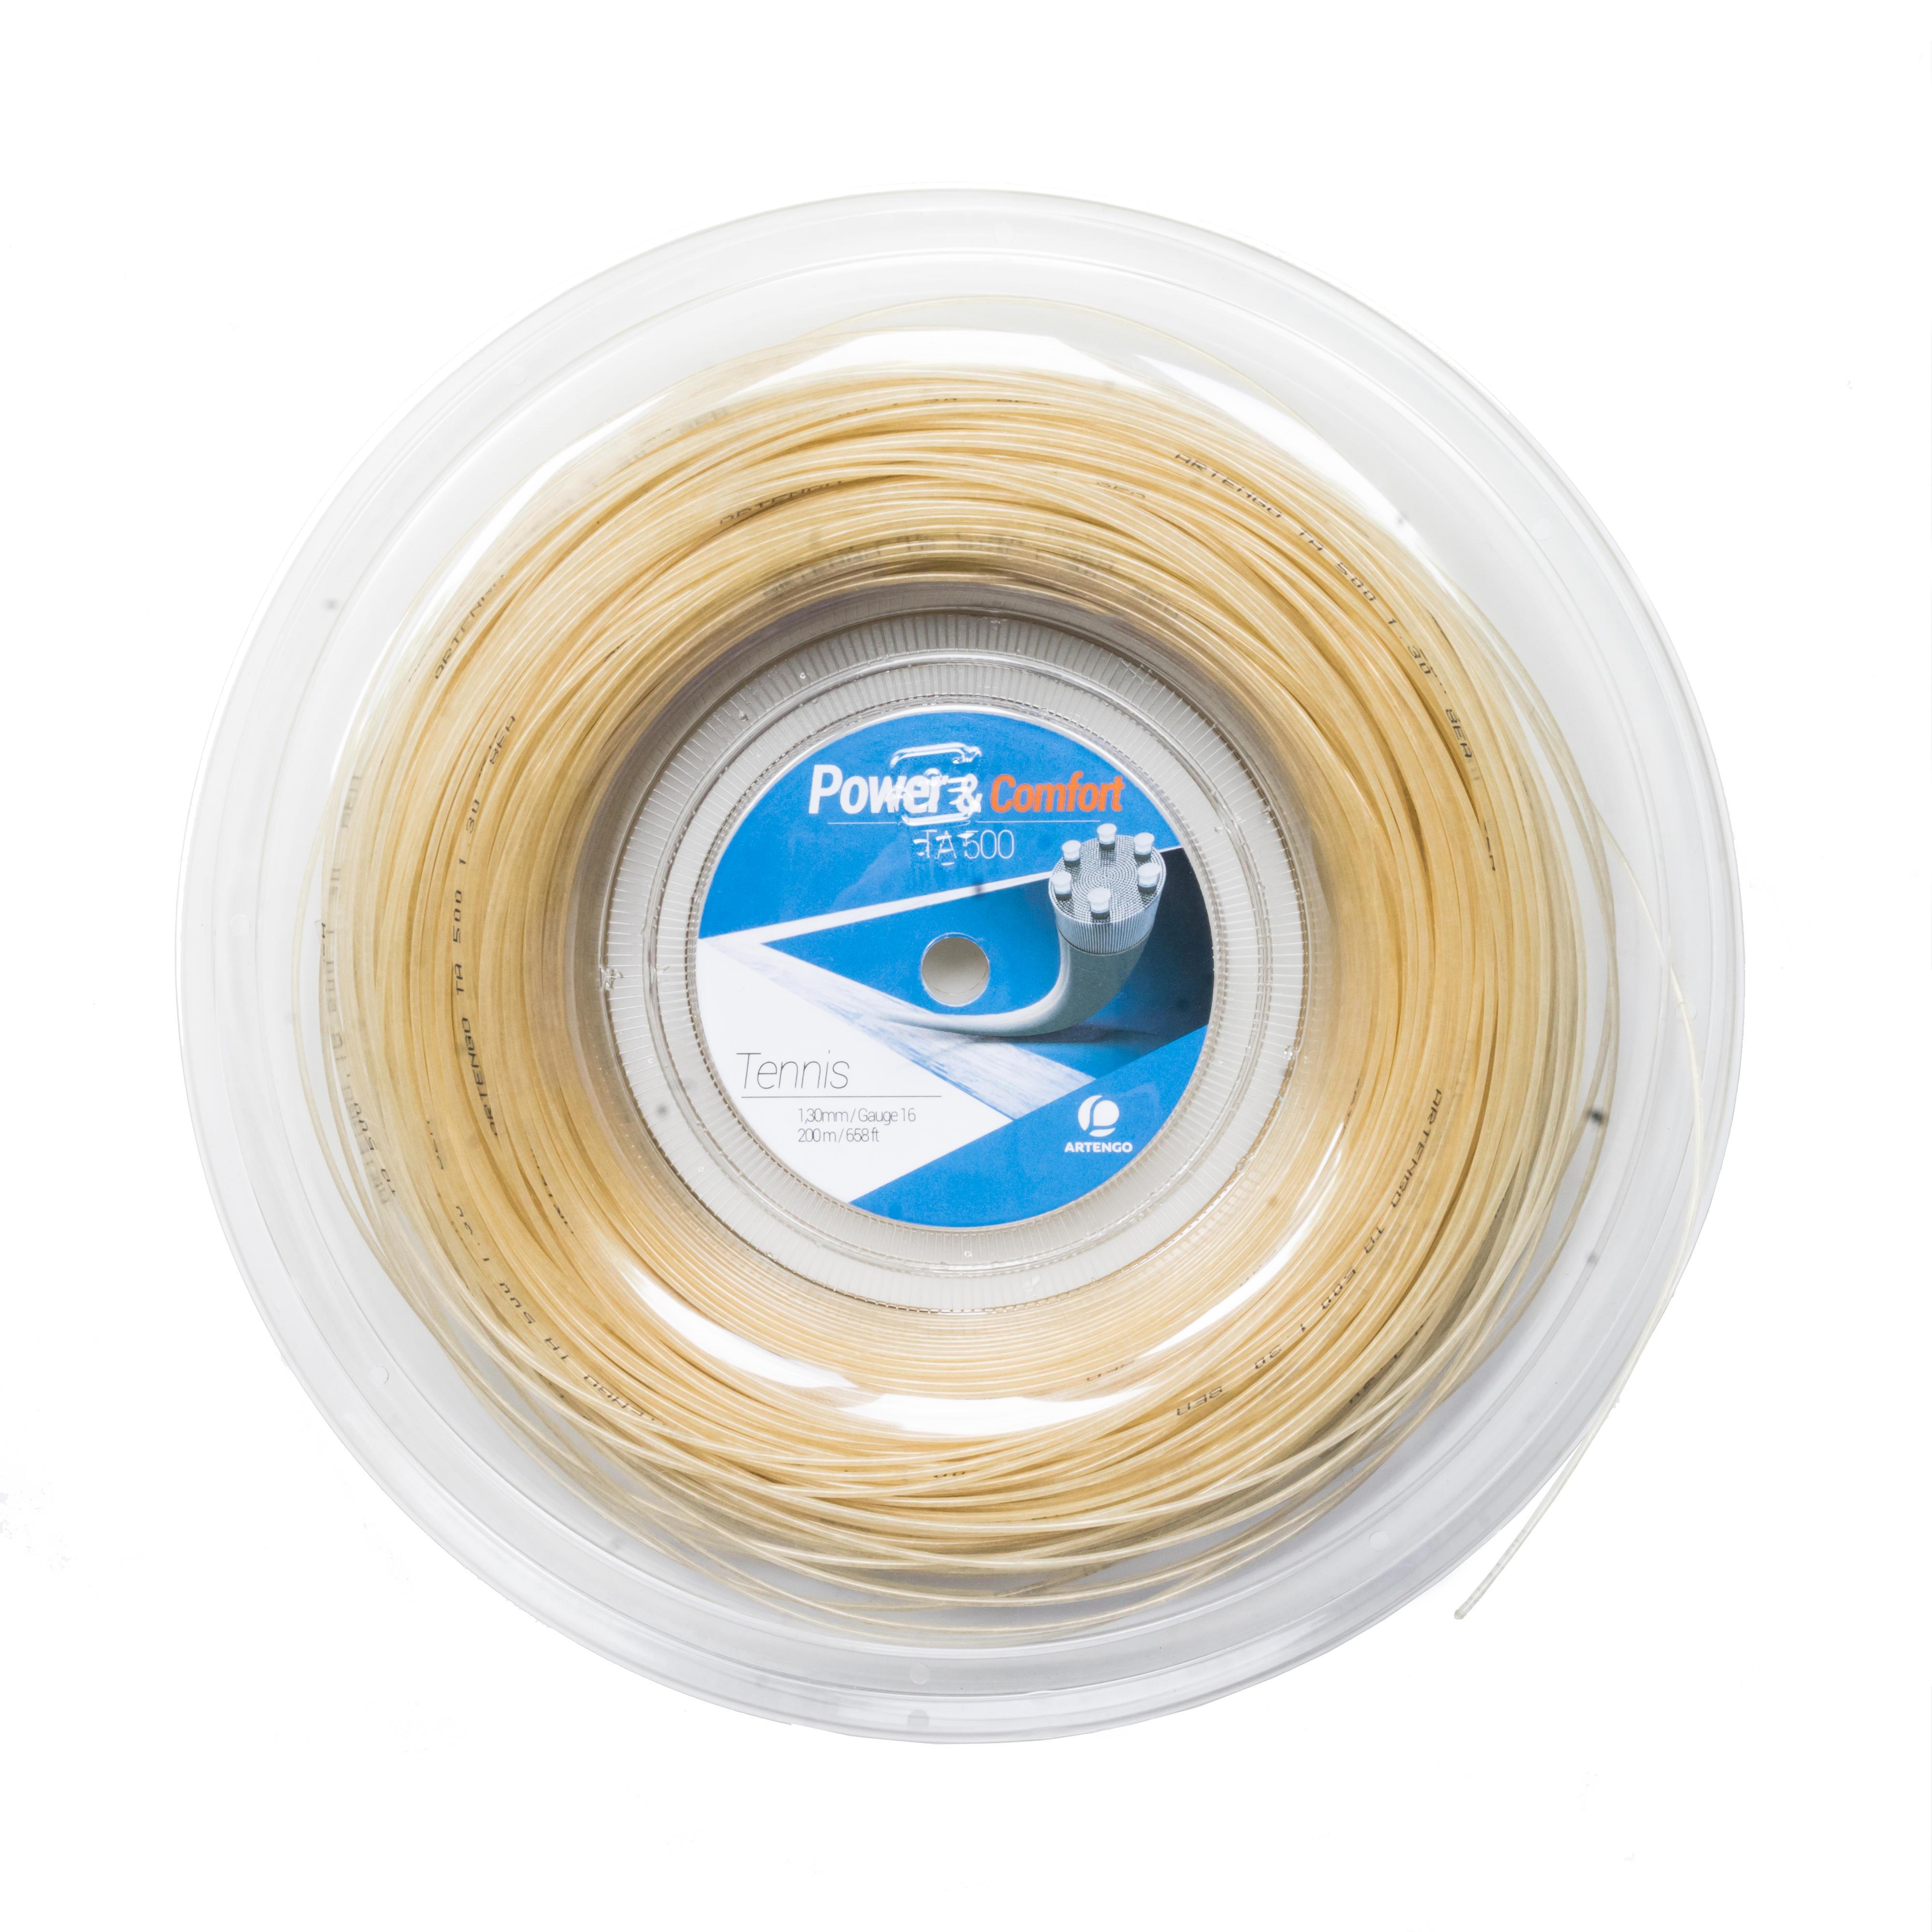 TA800 1.30 mm Multifilament Tennis String 200 m - Beige